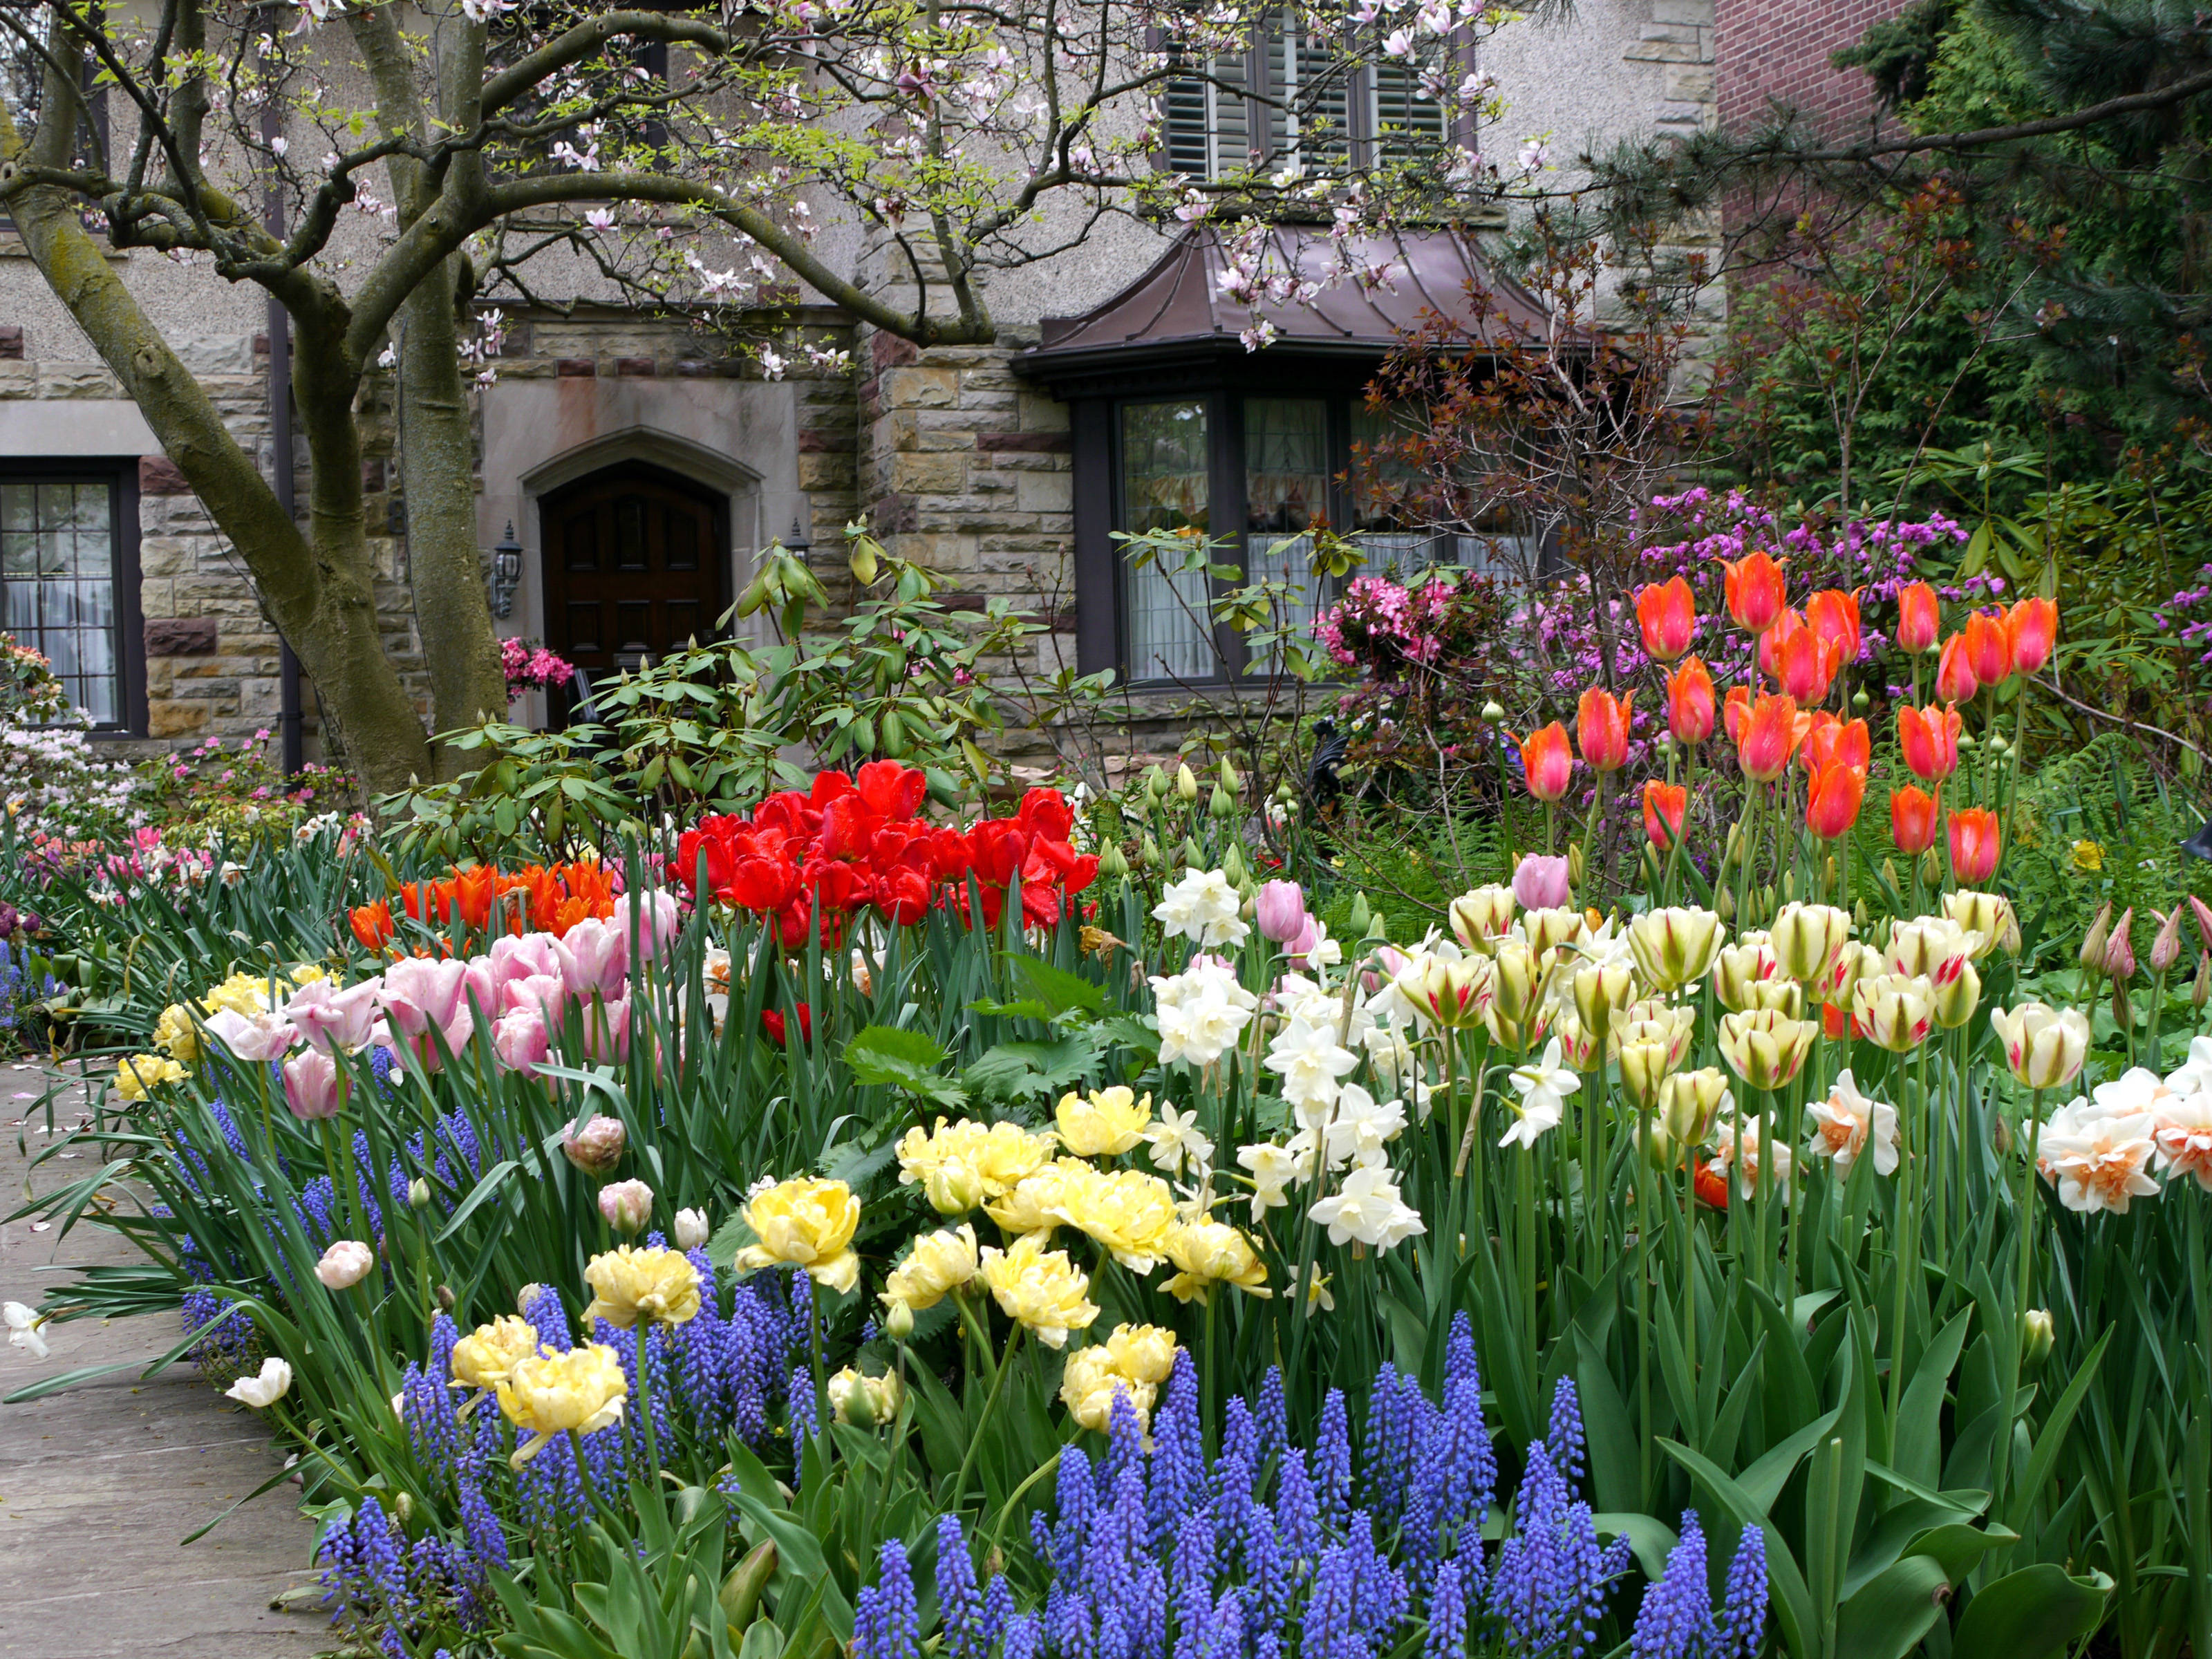 house tulips spring flowers.jpg